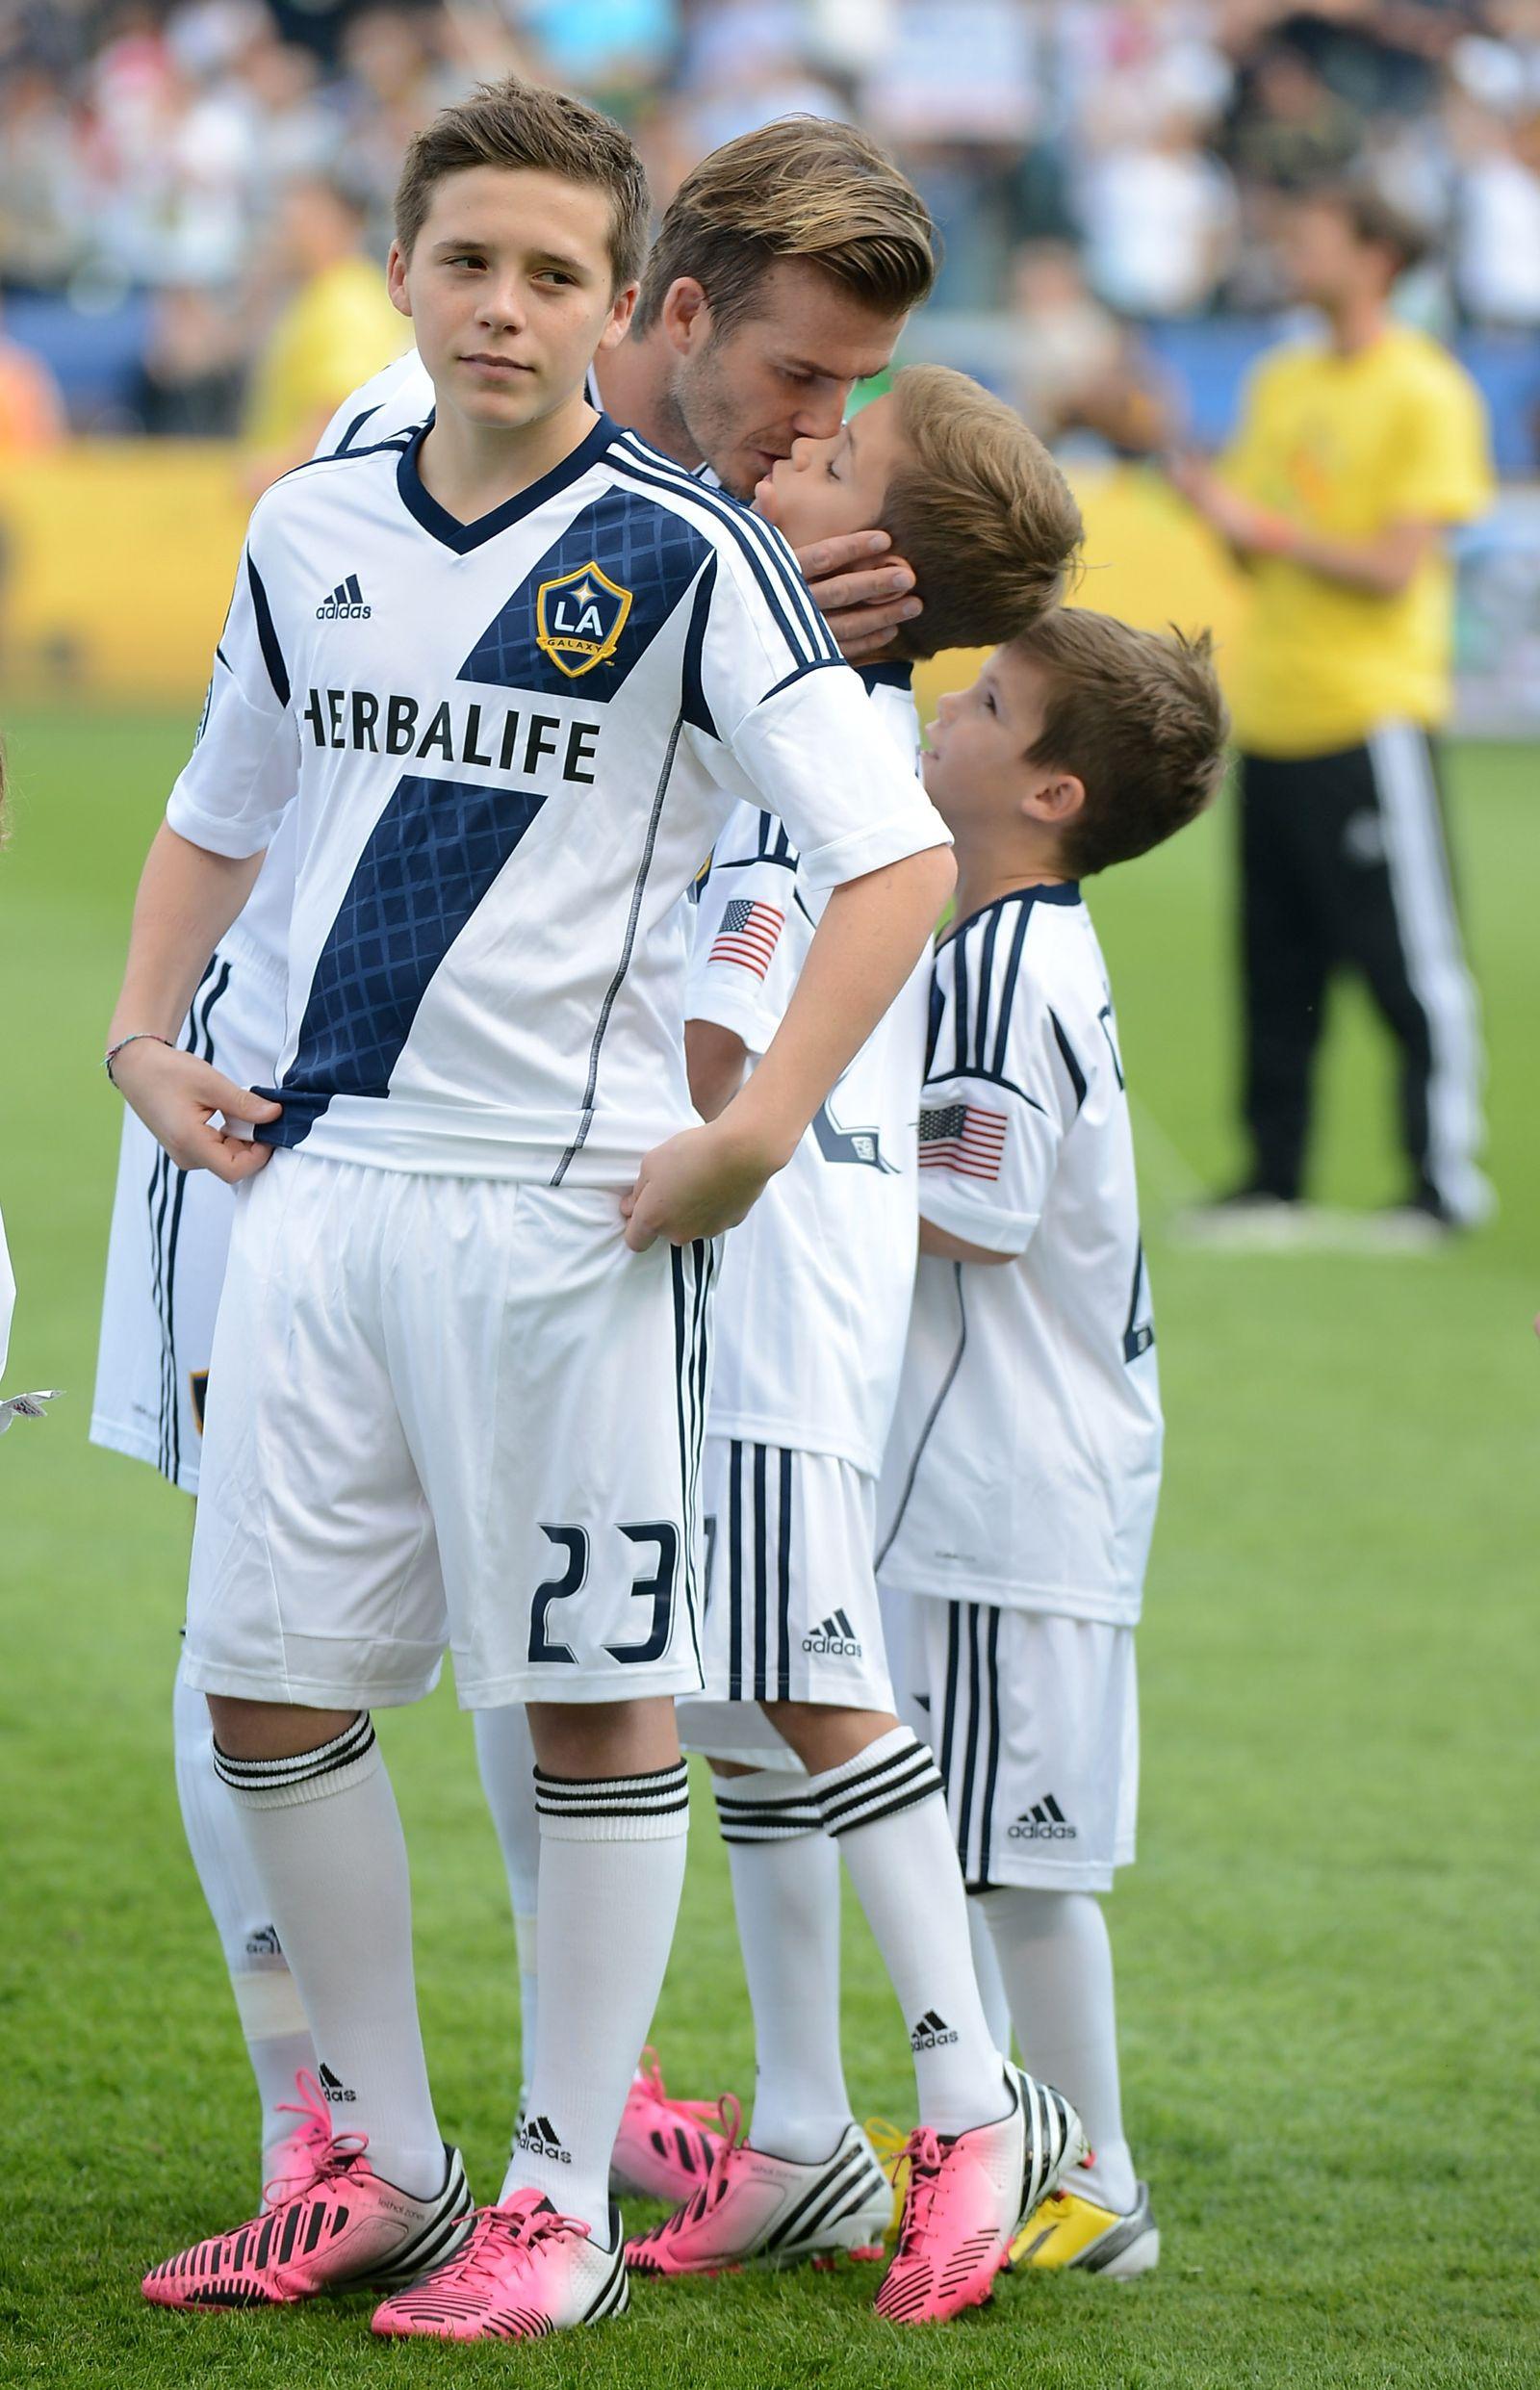 Brooklyn Beckham / David Beckham / Romeo / Cruz